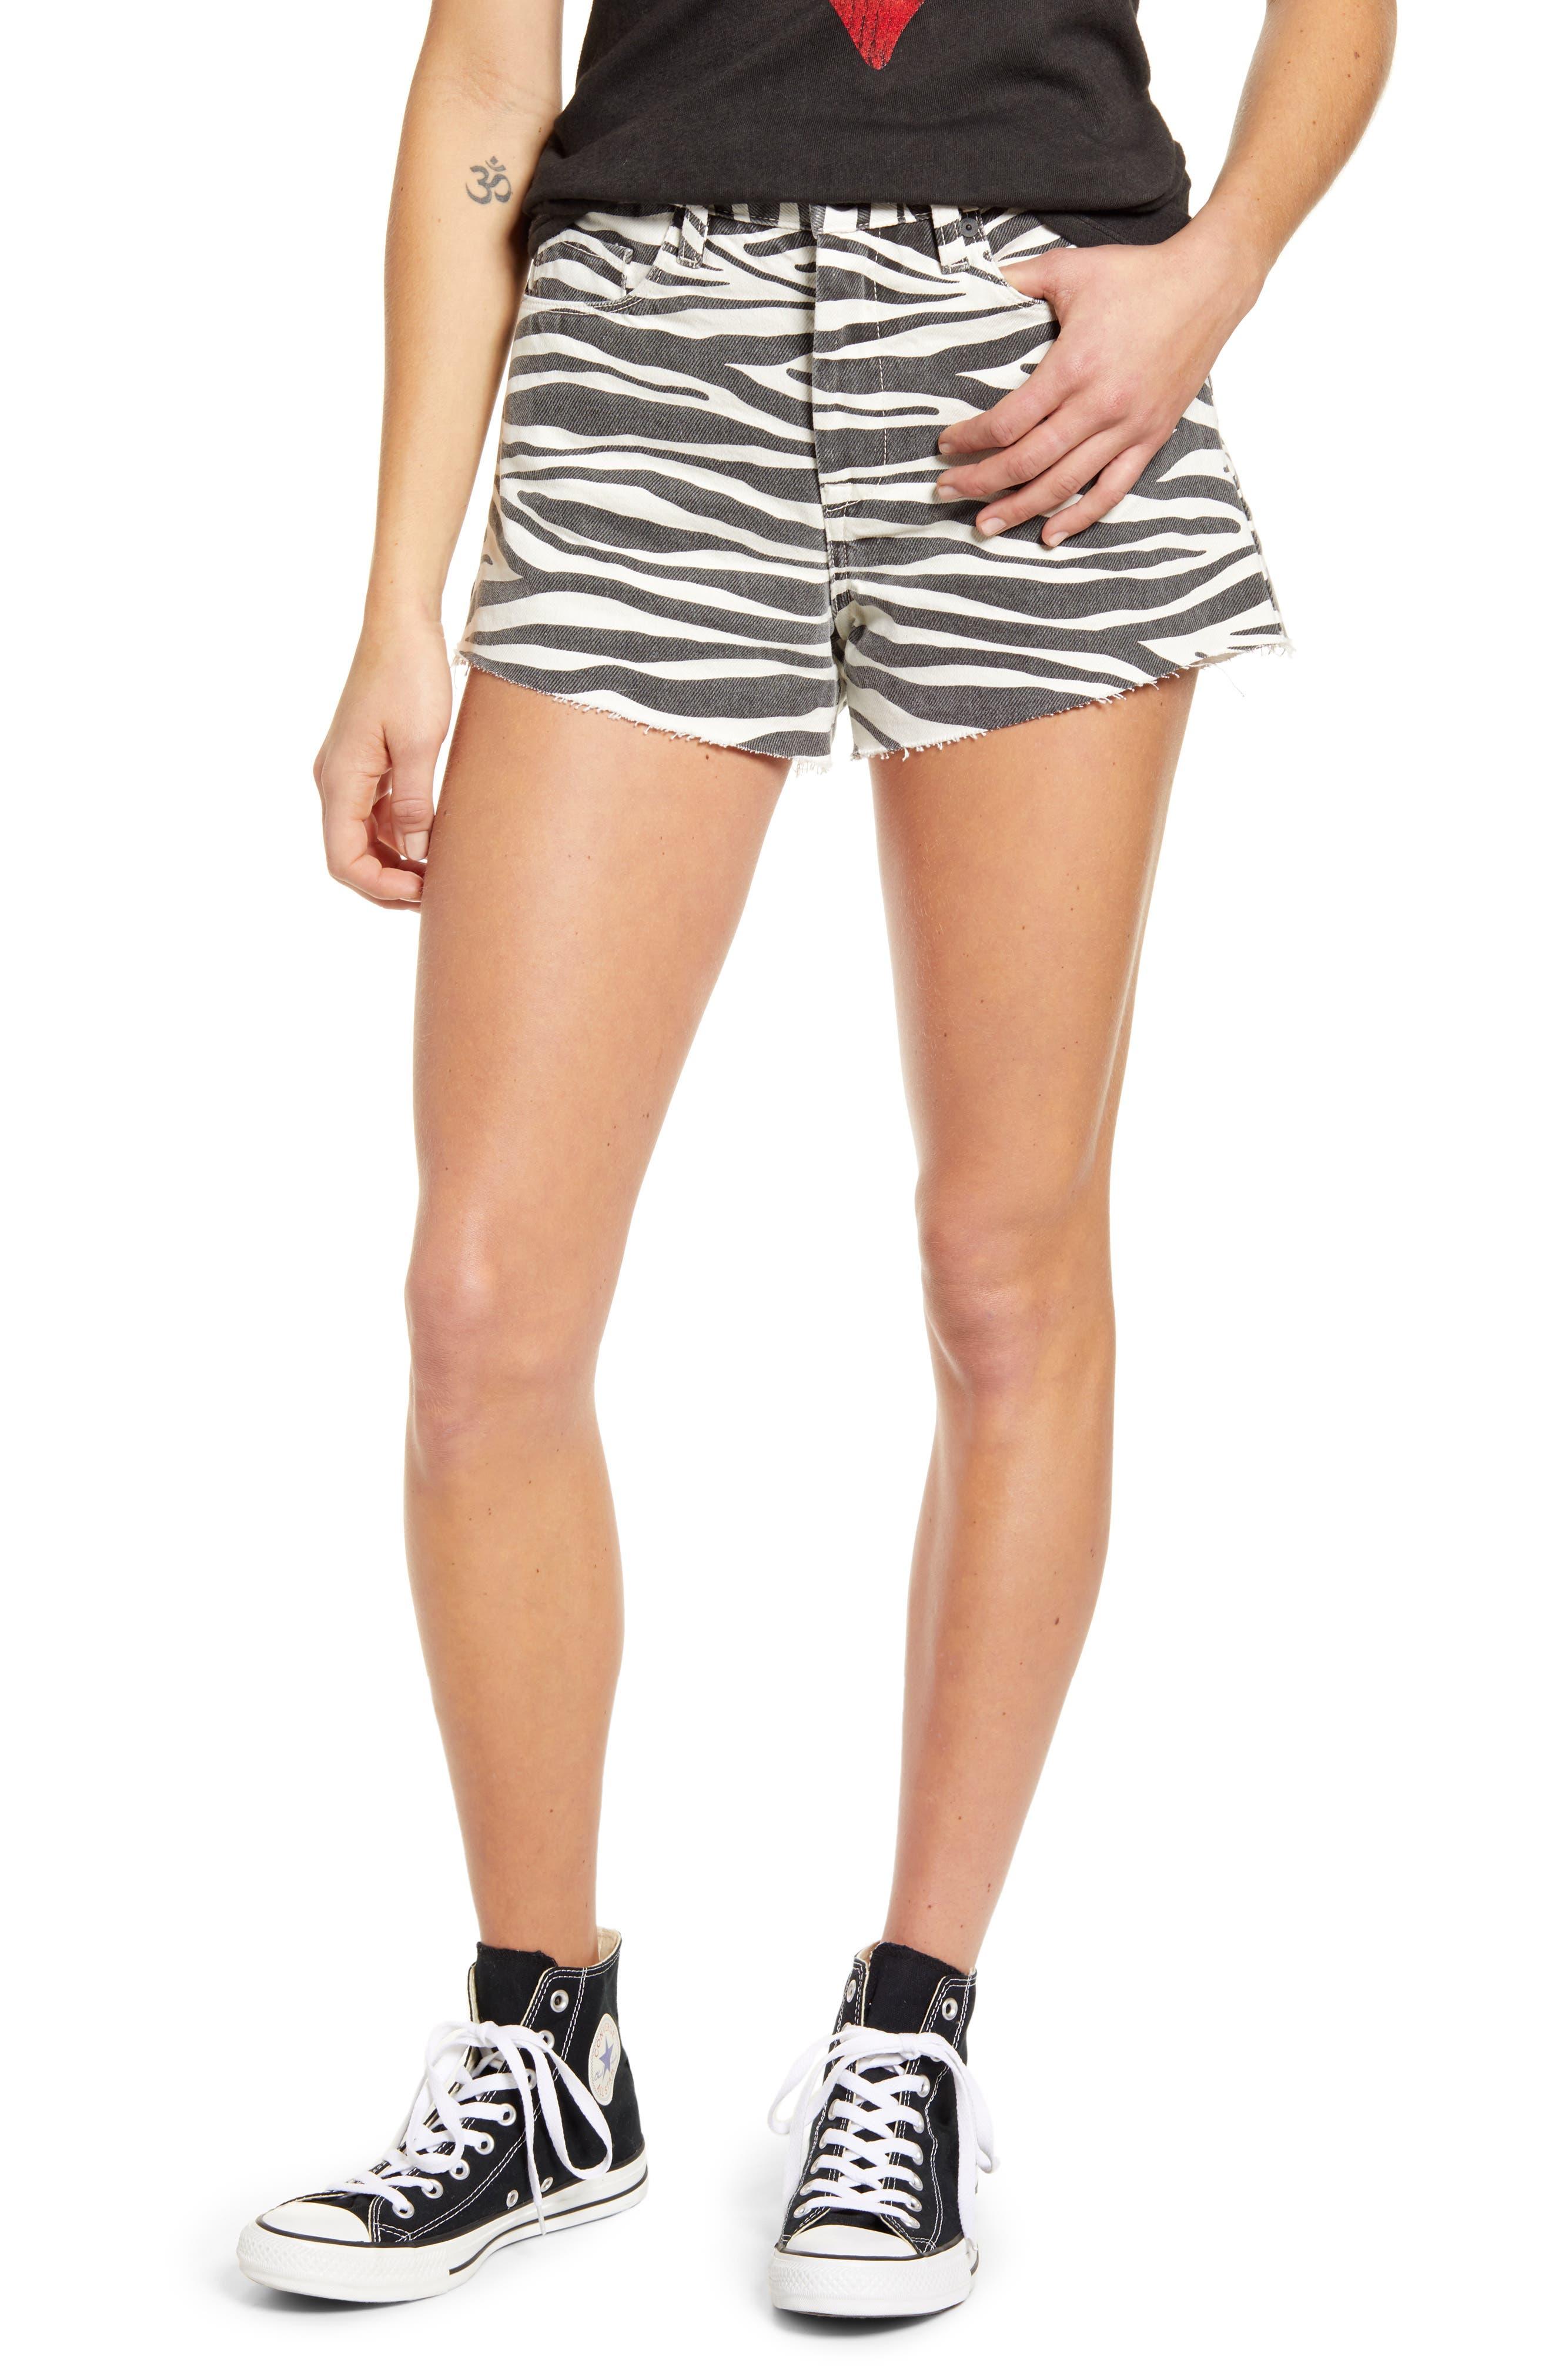 Women's Blanknyc The Barrow Tiger Print High Waist Denim Shorts,  24 - Black